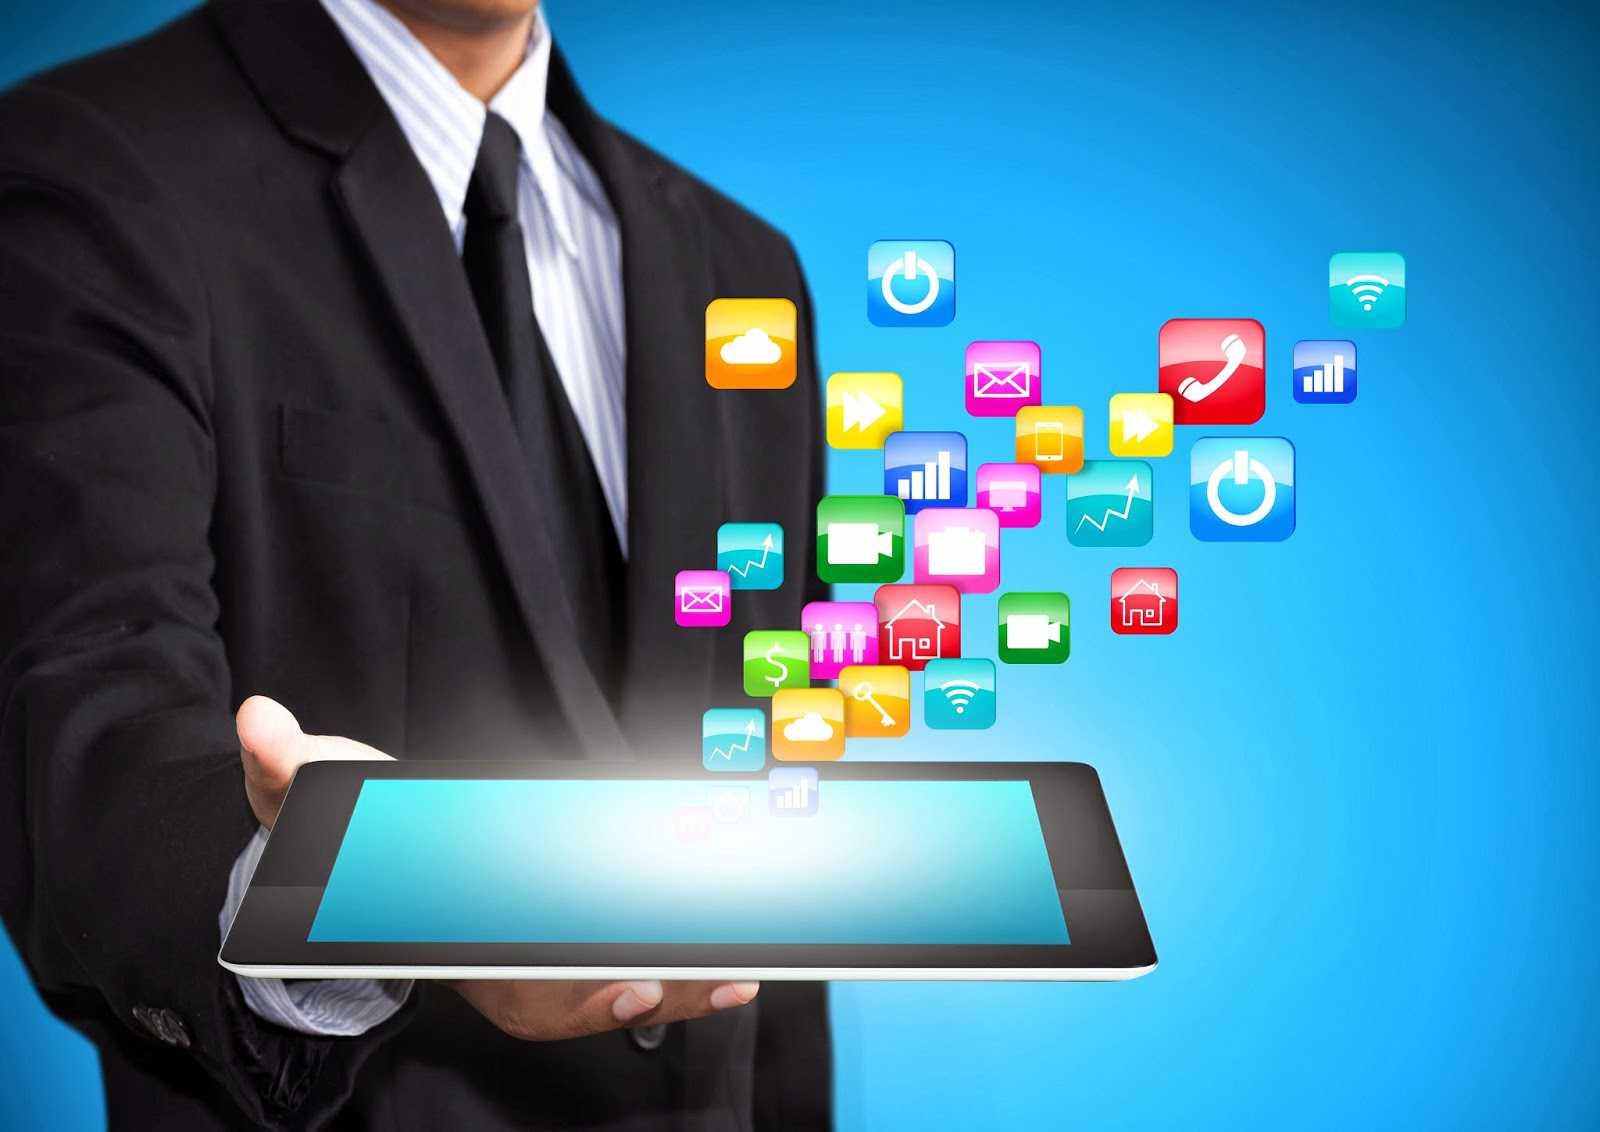 Simespi aborda redes sociais para potencializar negócios